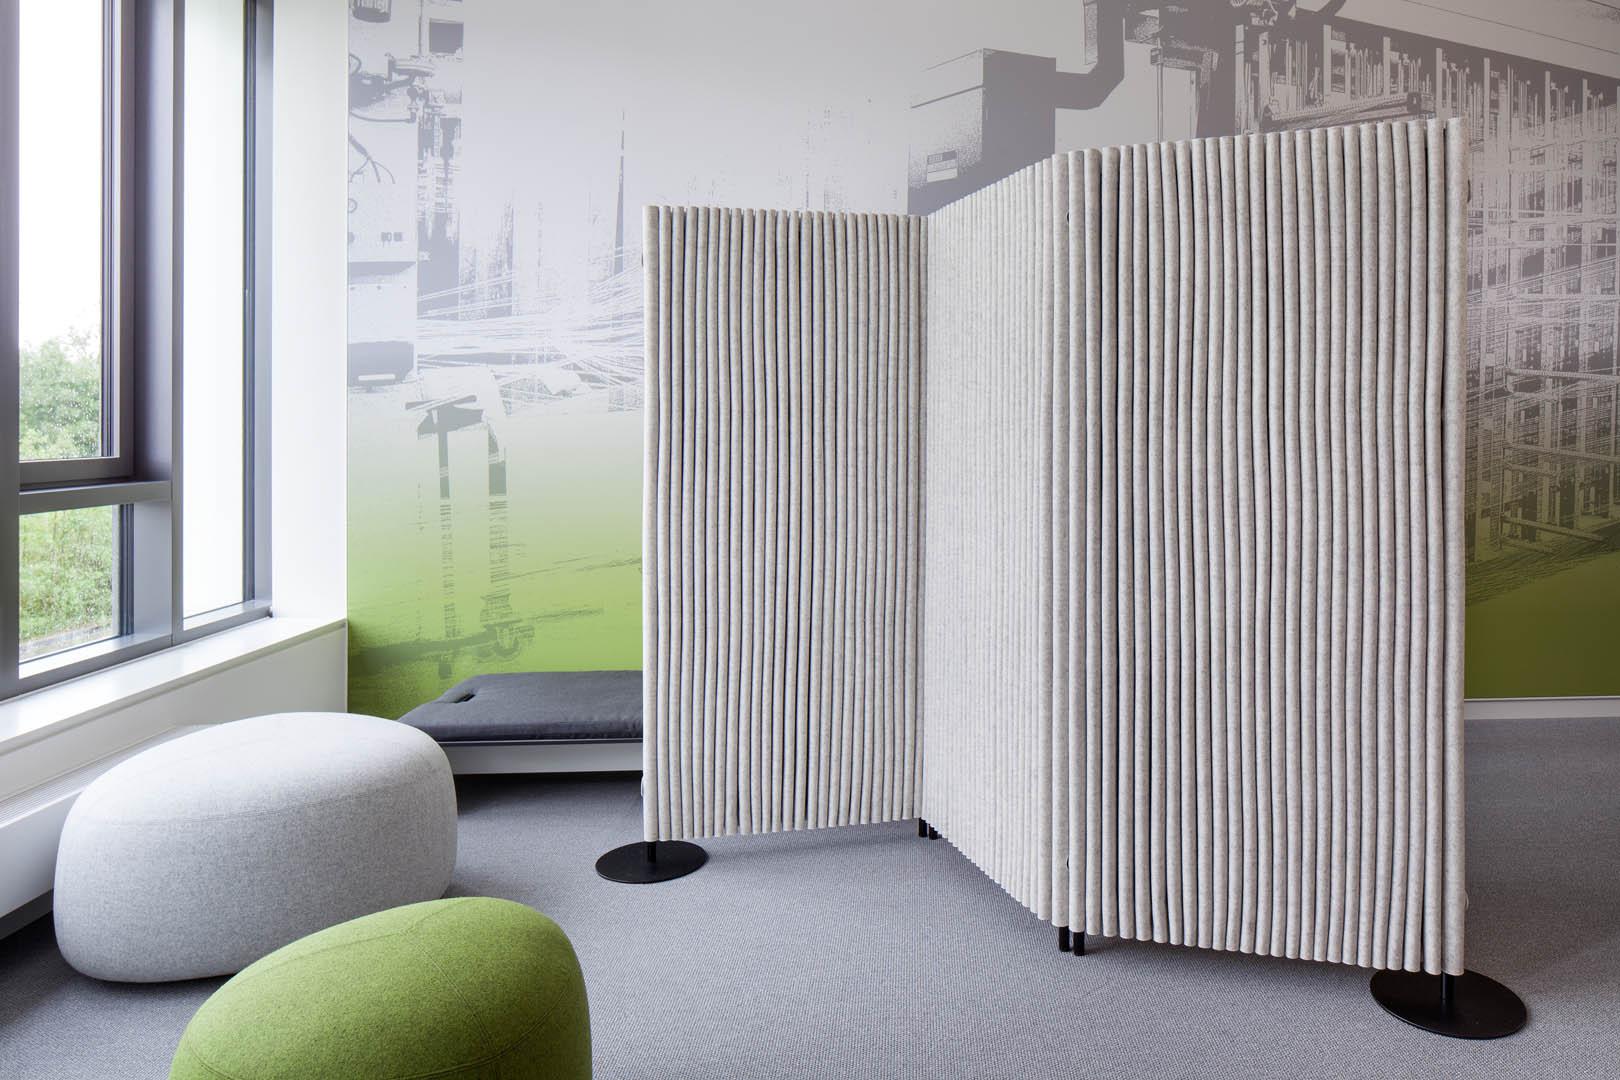 new headquarters of association of the northwest german. Black Bedroom Furniture Sets. Home Design Ideas